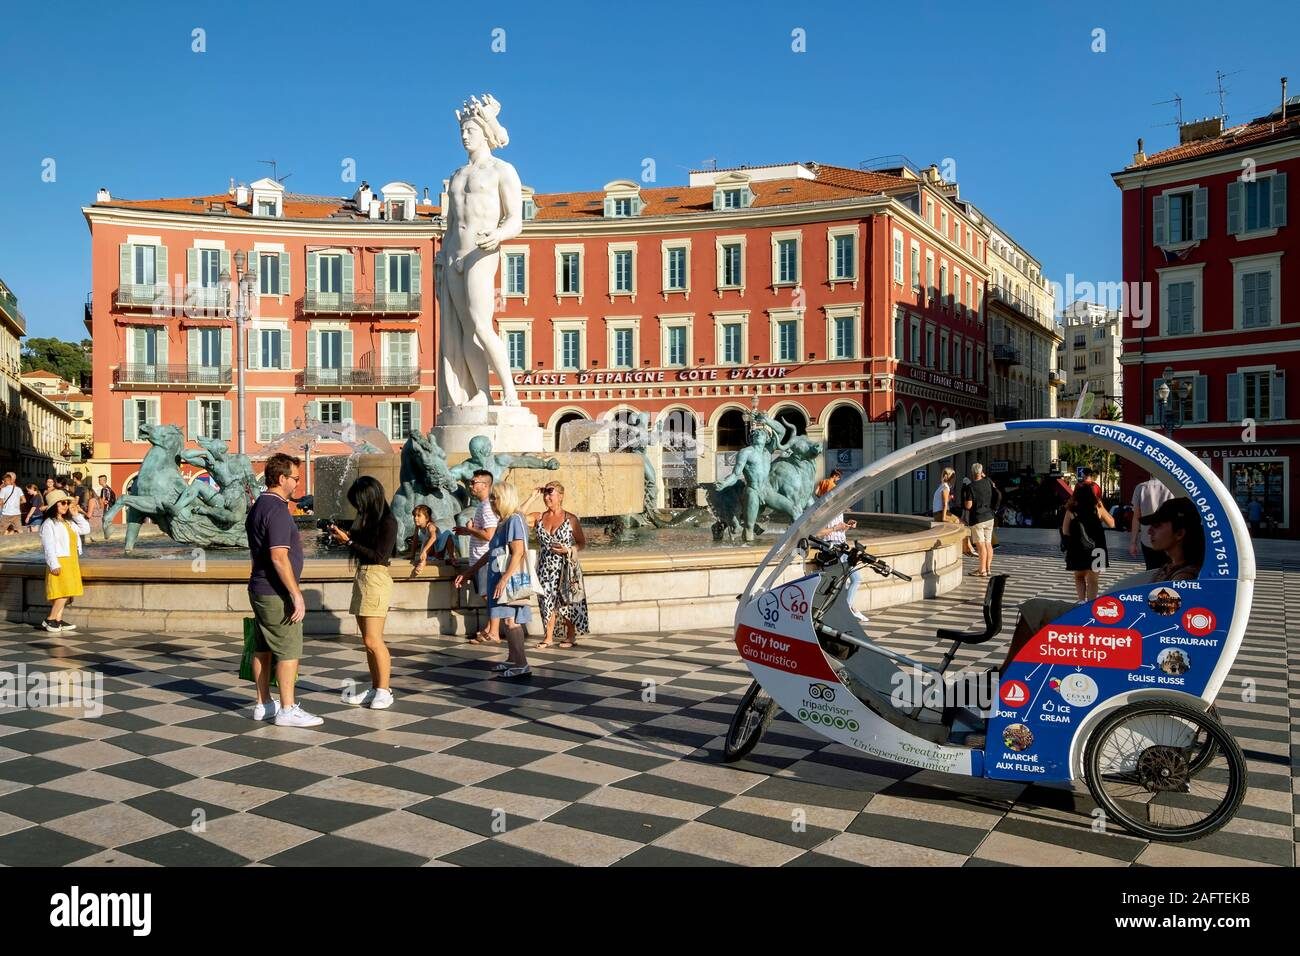 Fontaine du soleil / Fountain of the Sun, statue of Apollo, Place Masséna Square, Nice, Côte d'Azur, France, Europe Stock Photo